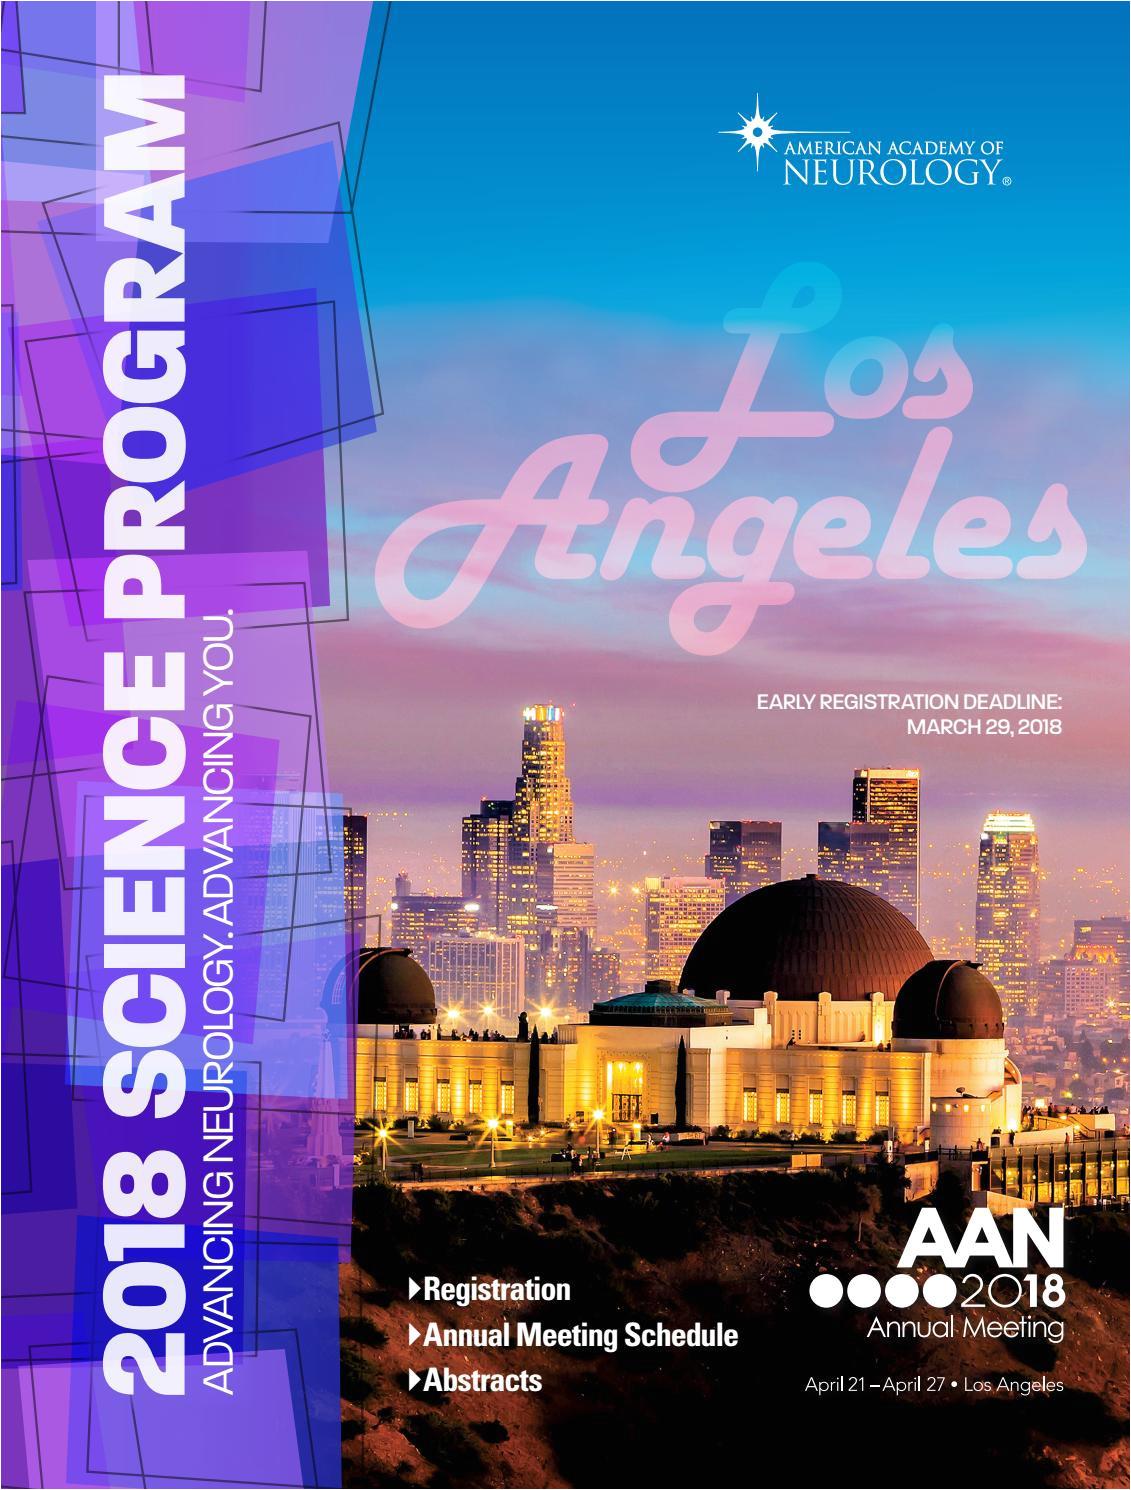 2018 aan annual meeting science program by american academy of neurology issuu